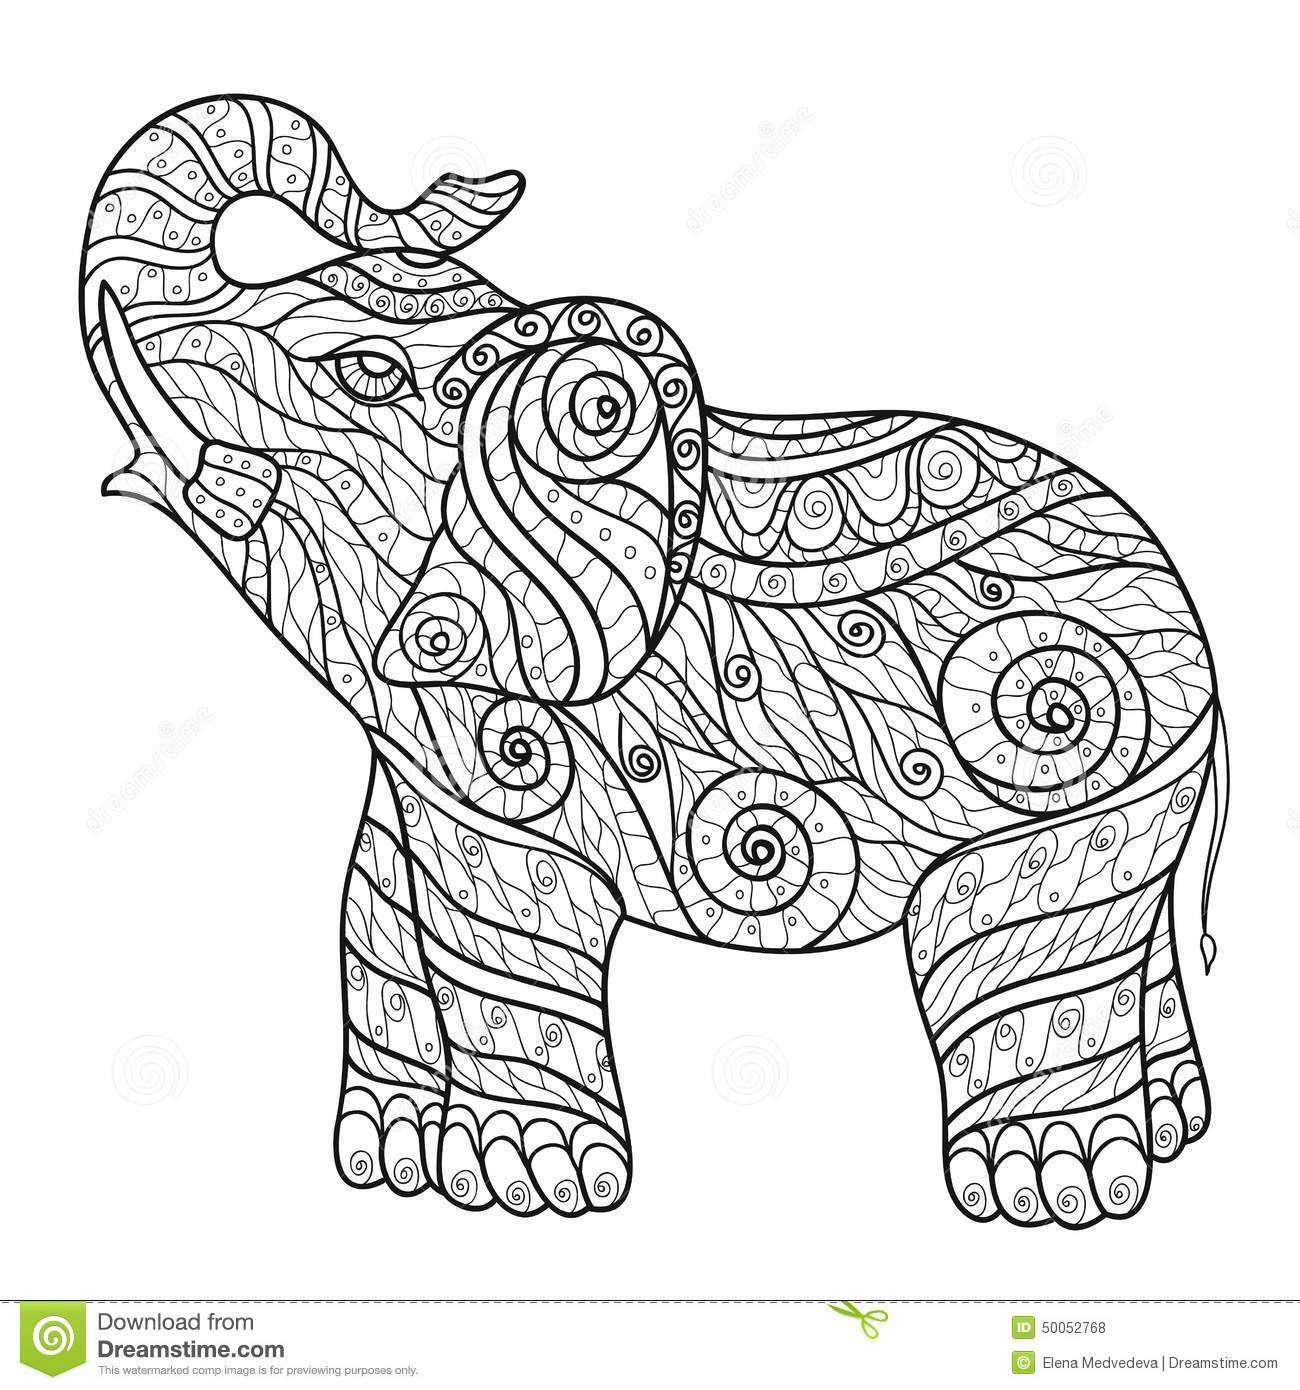 Giraffe zentangle buscar con google zentangle for Giraffe mandala coloring pages